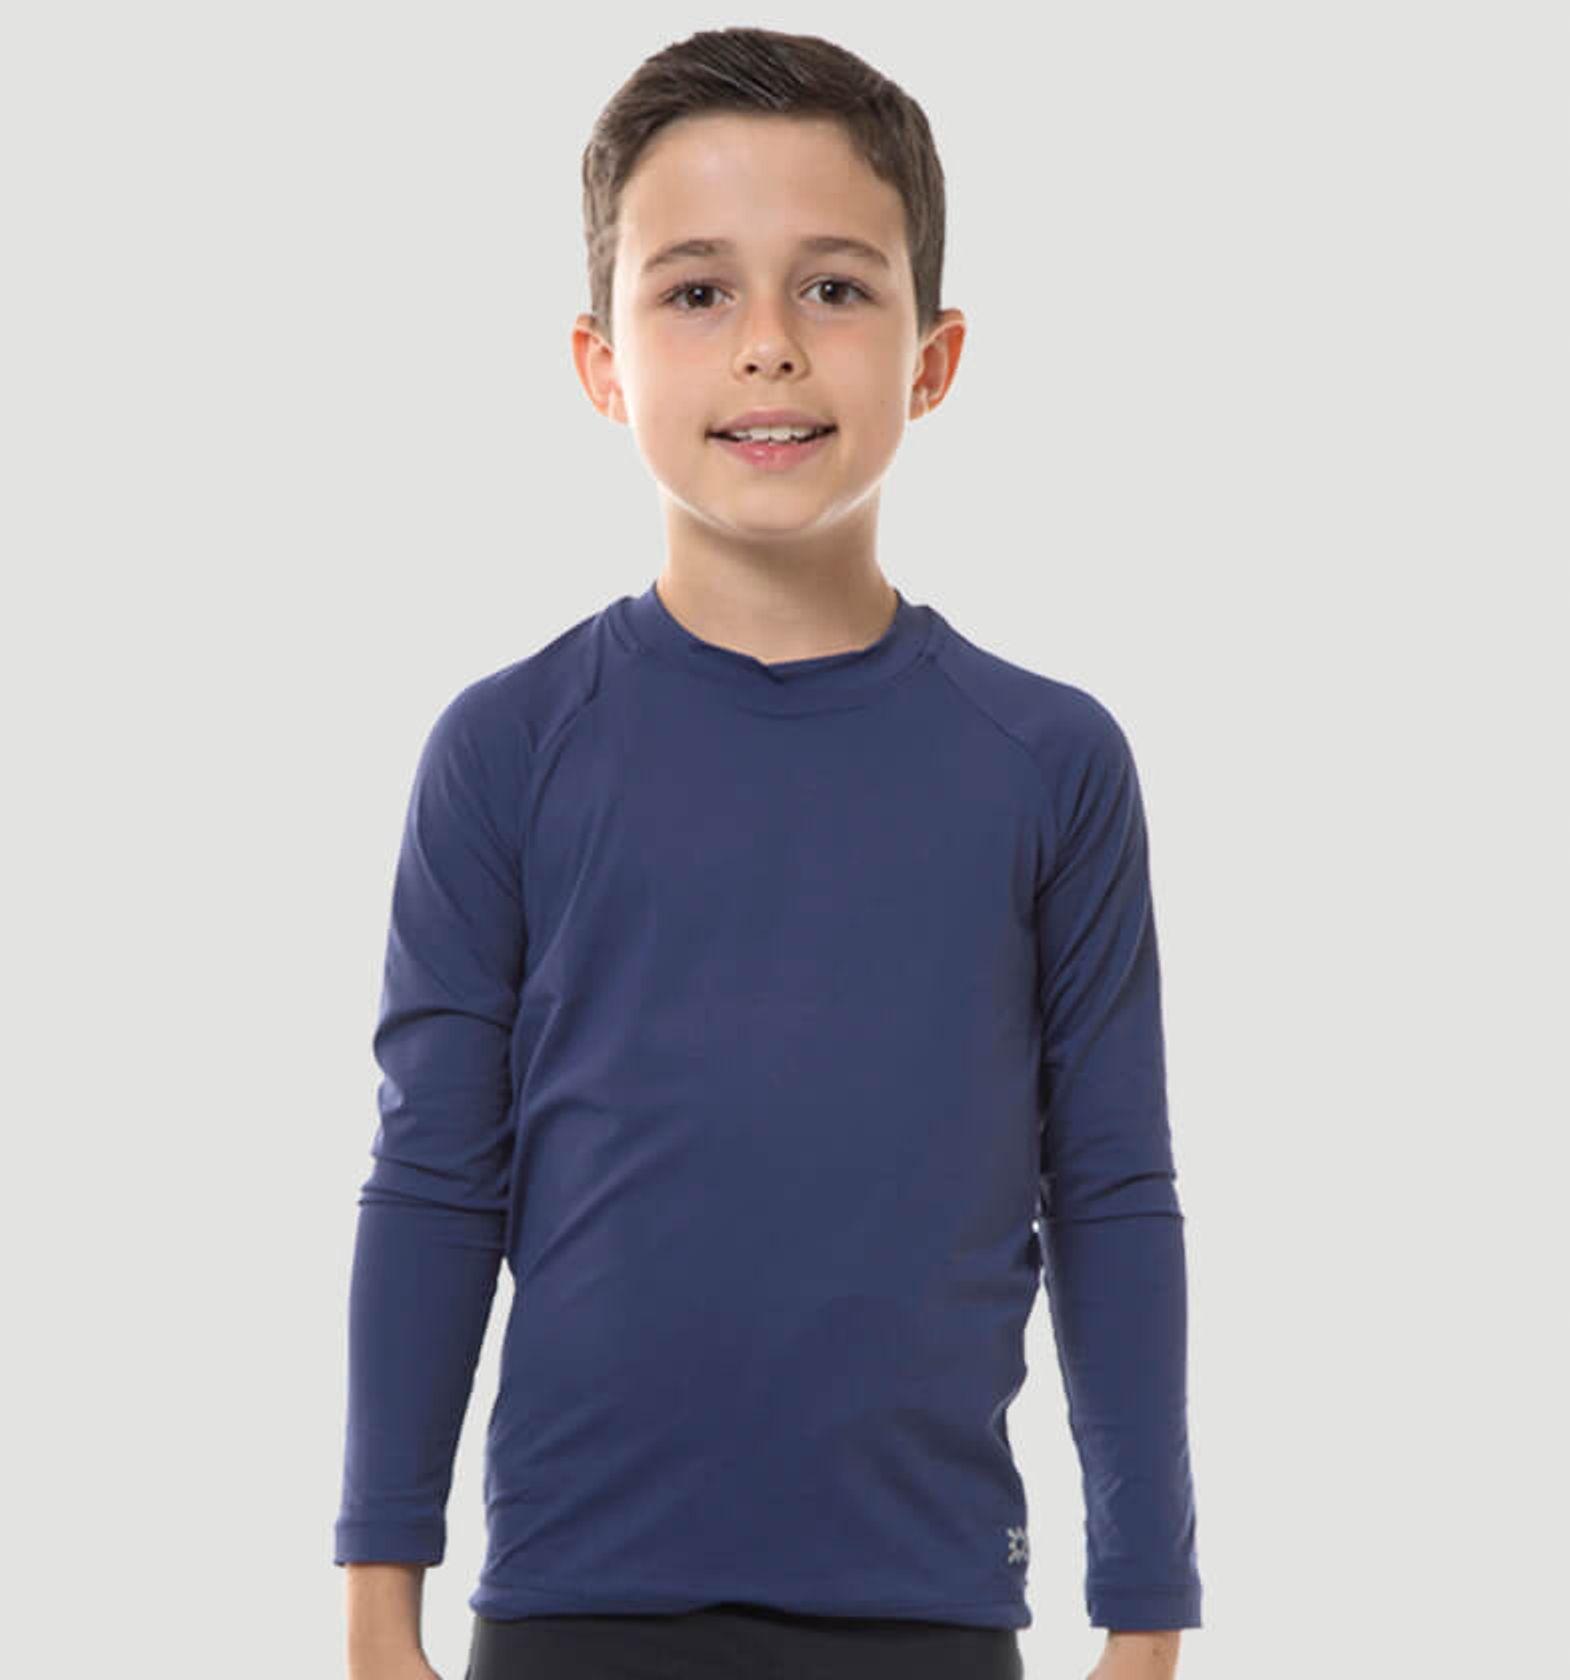 UV LINE Camiseta Uvpro Manga Longa Infantil Marinho Proteção Solar